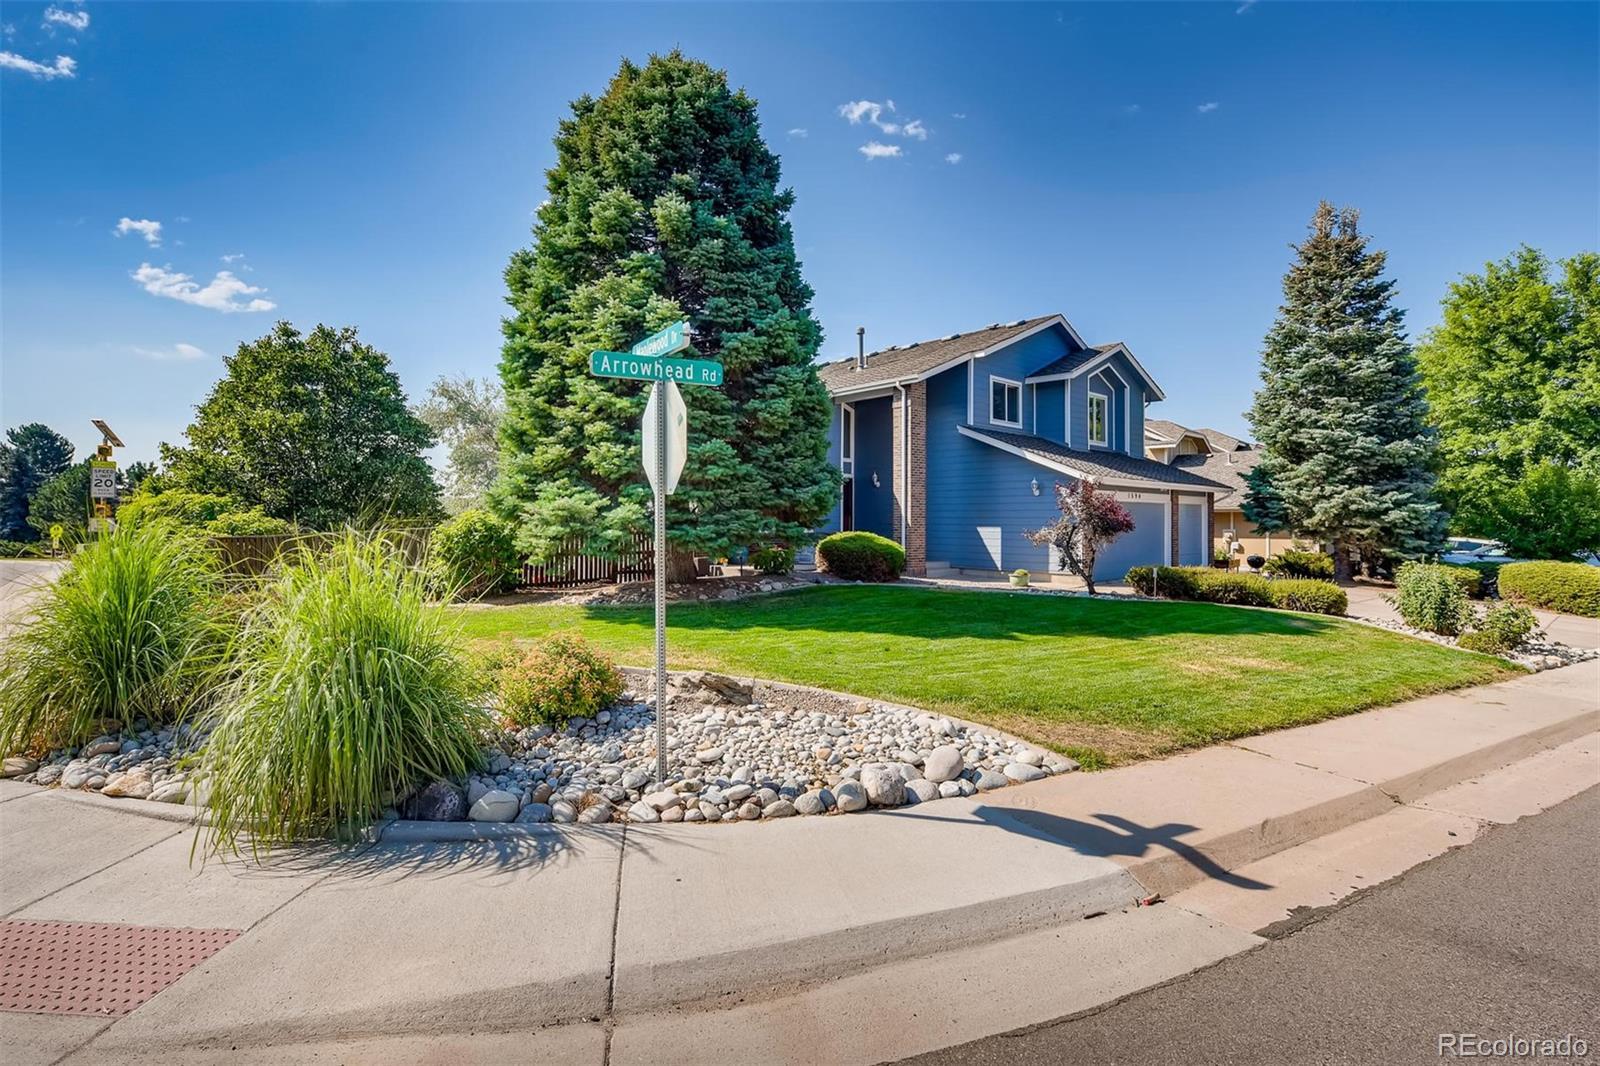 MLS# 2832026 - 3 - 1594 Arrowhead Road, Highlands Ranch, CO 80126